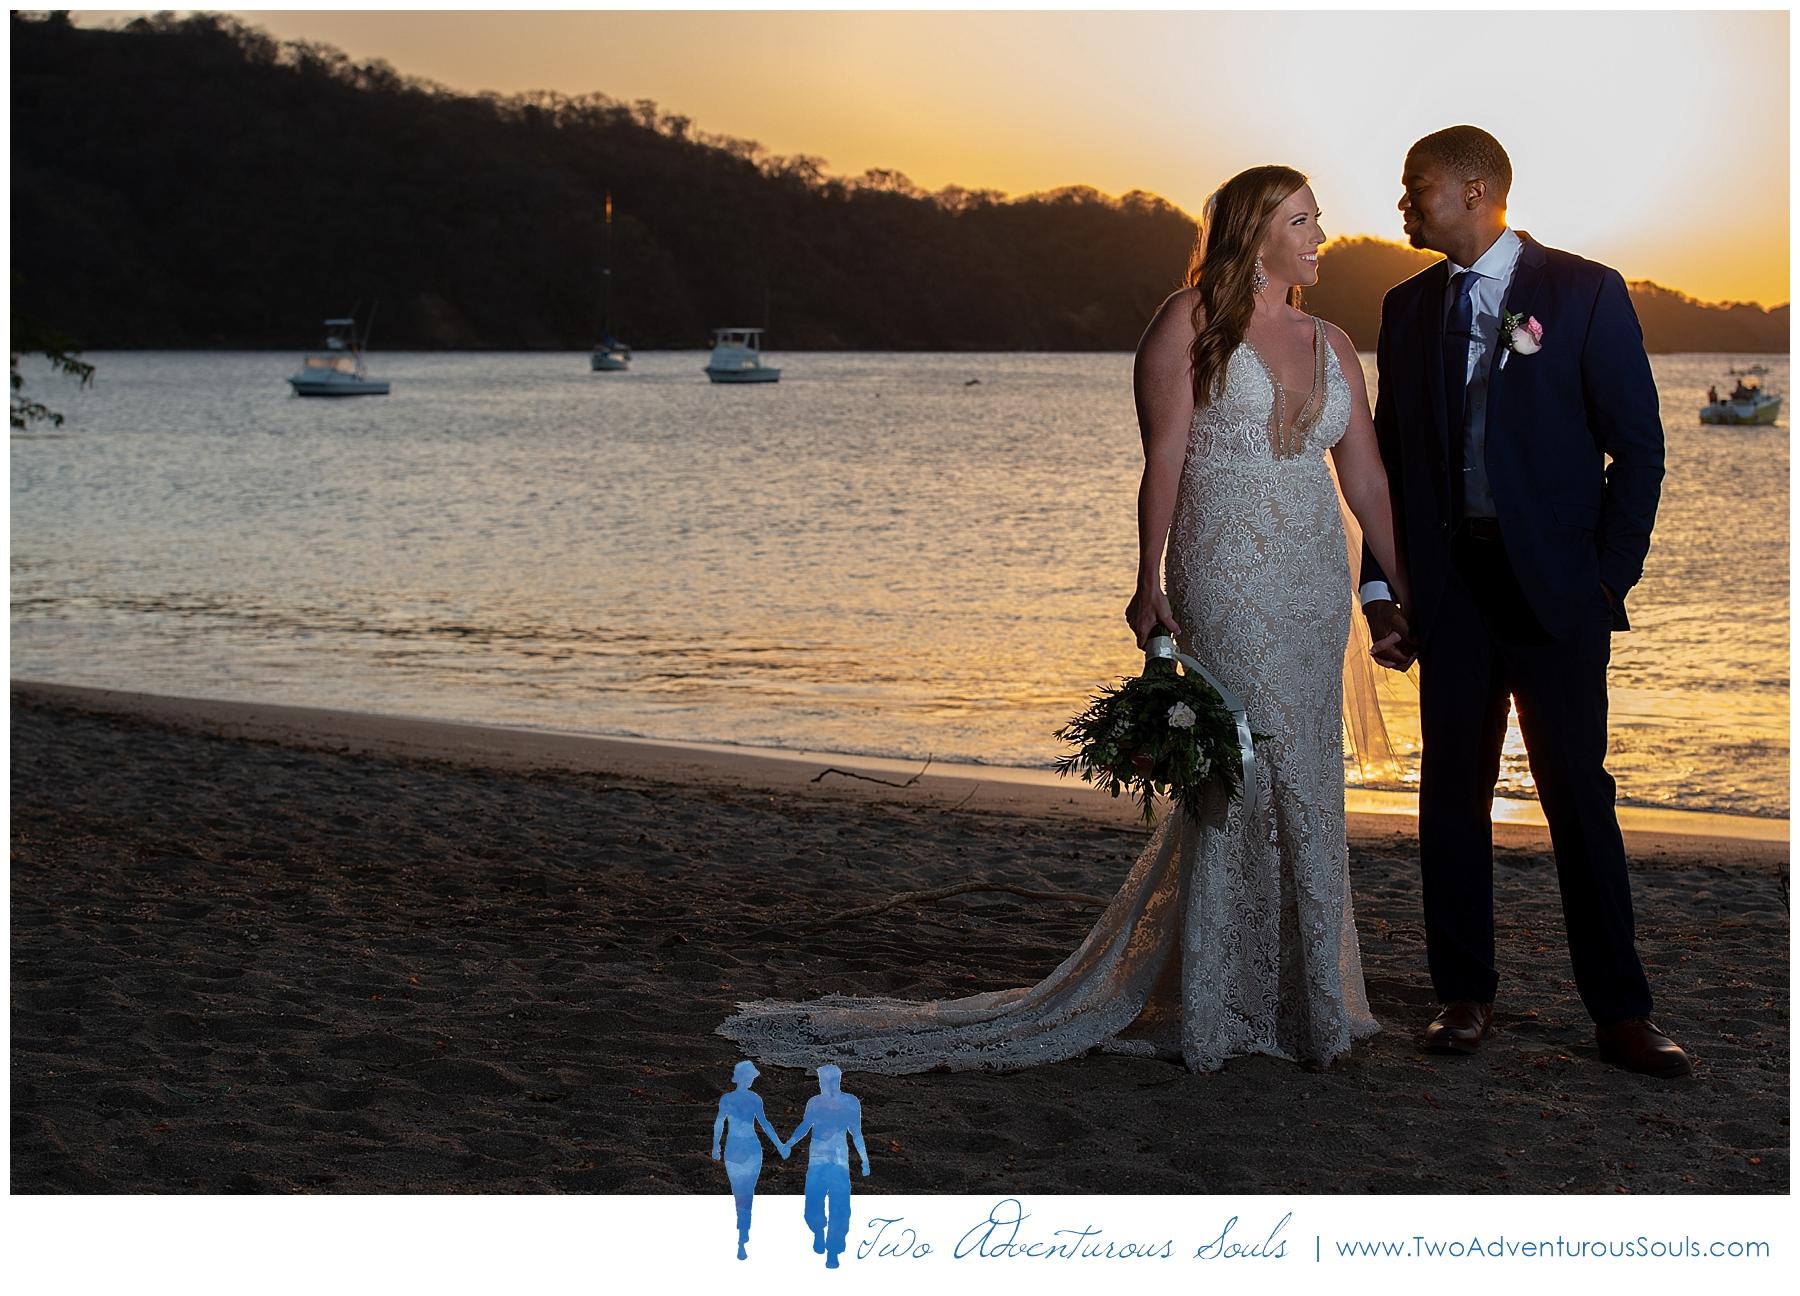 Costa Rica Wedding Photographers, Dreams las Mareas Wedding, Destination Wedding Photographers, Two Adventurous Souls - 022219_0034.jpg